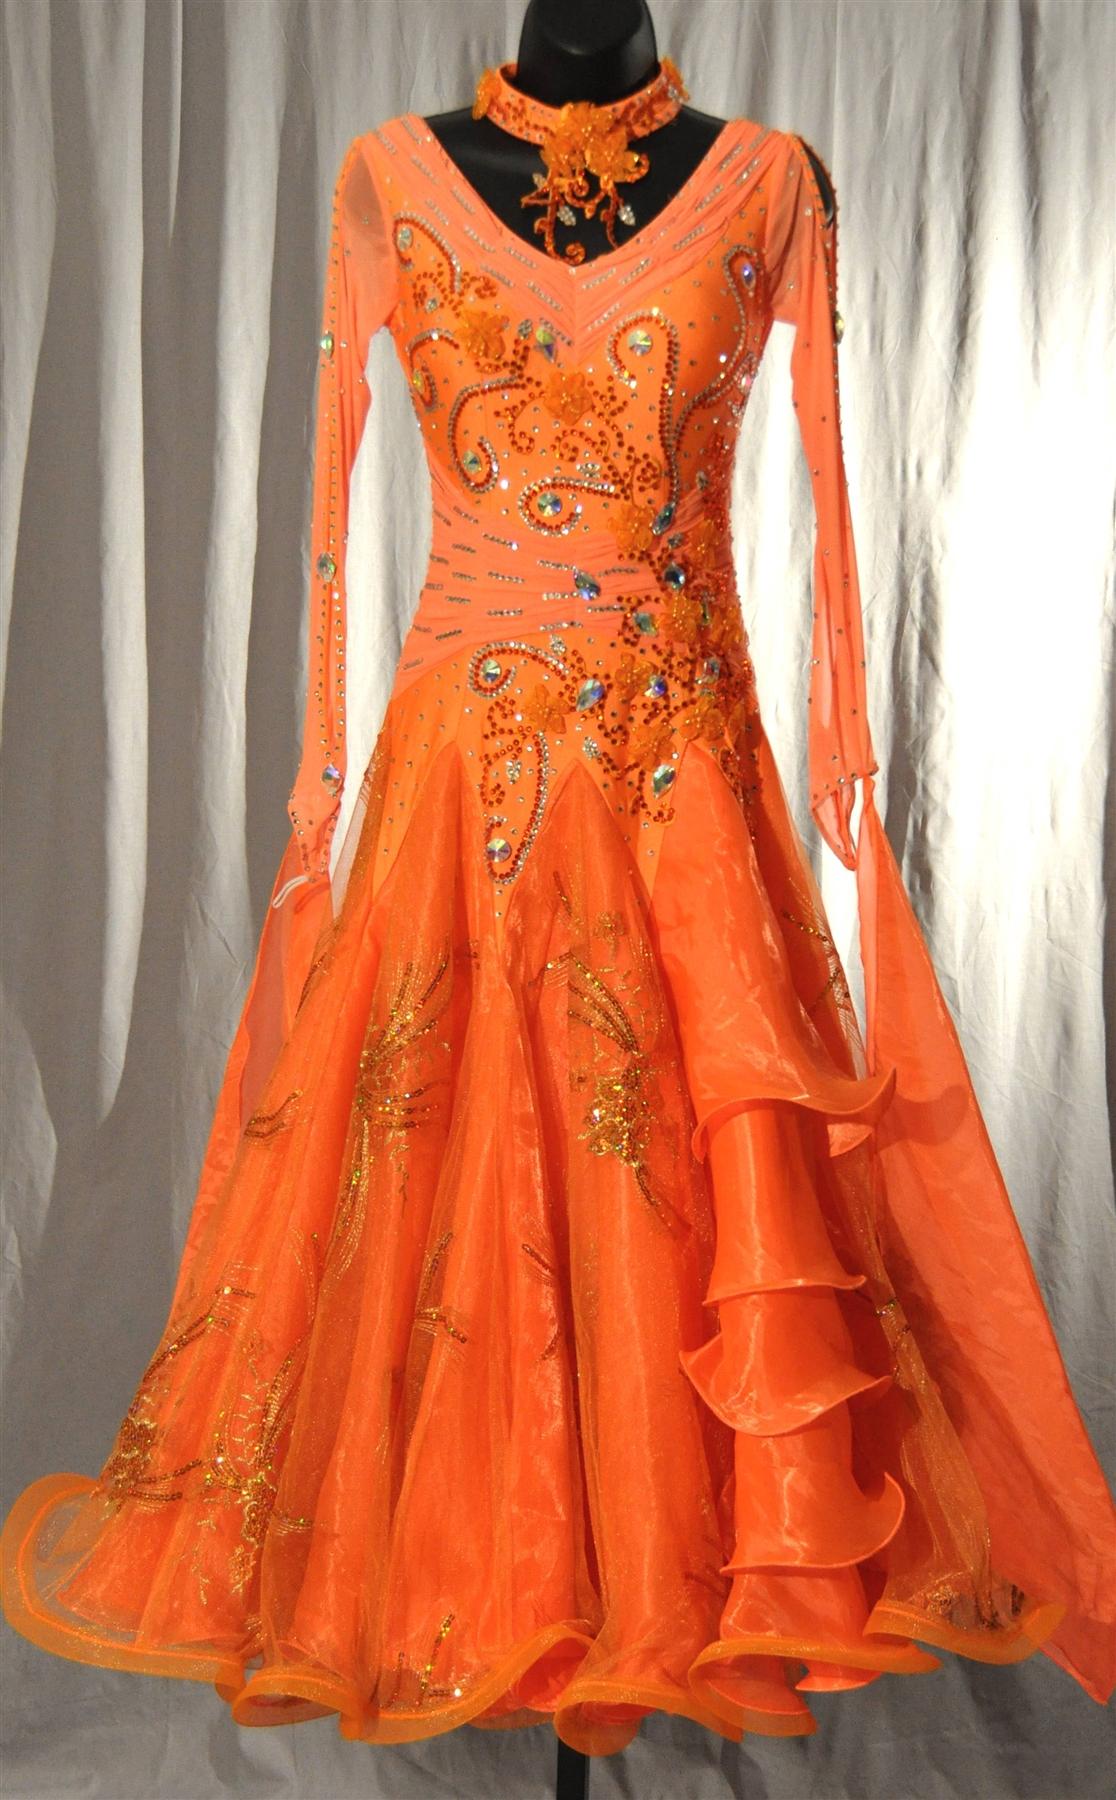 Elegant Orange Mesh Sleeves Ballroom Dress